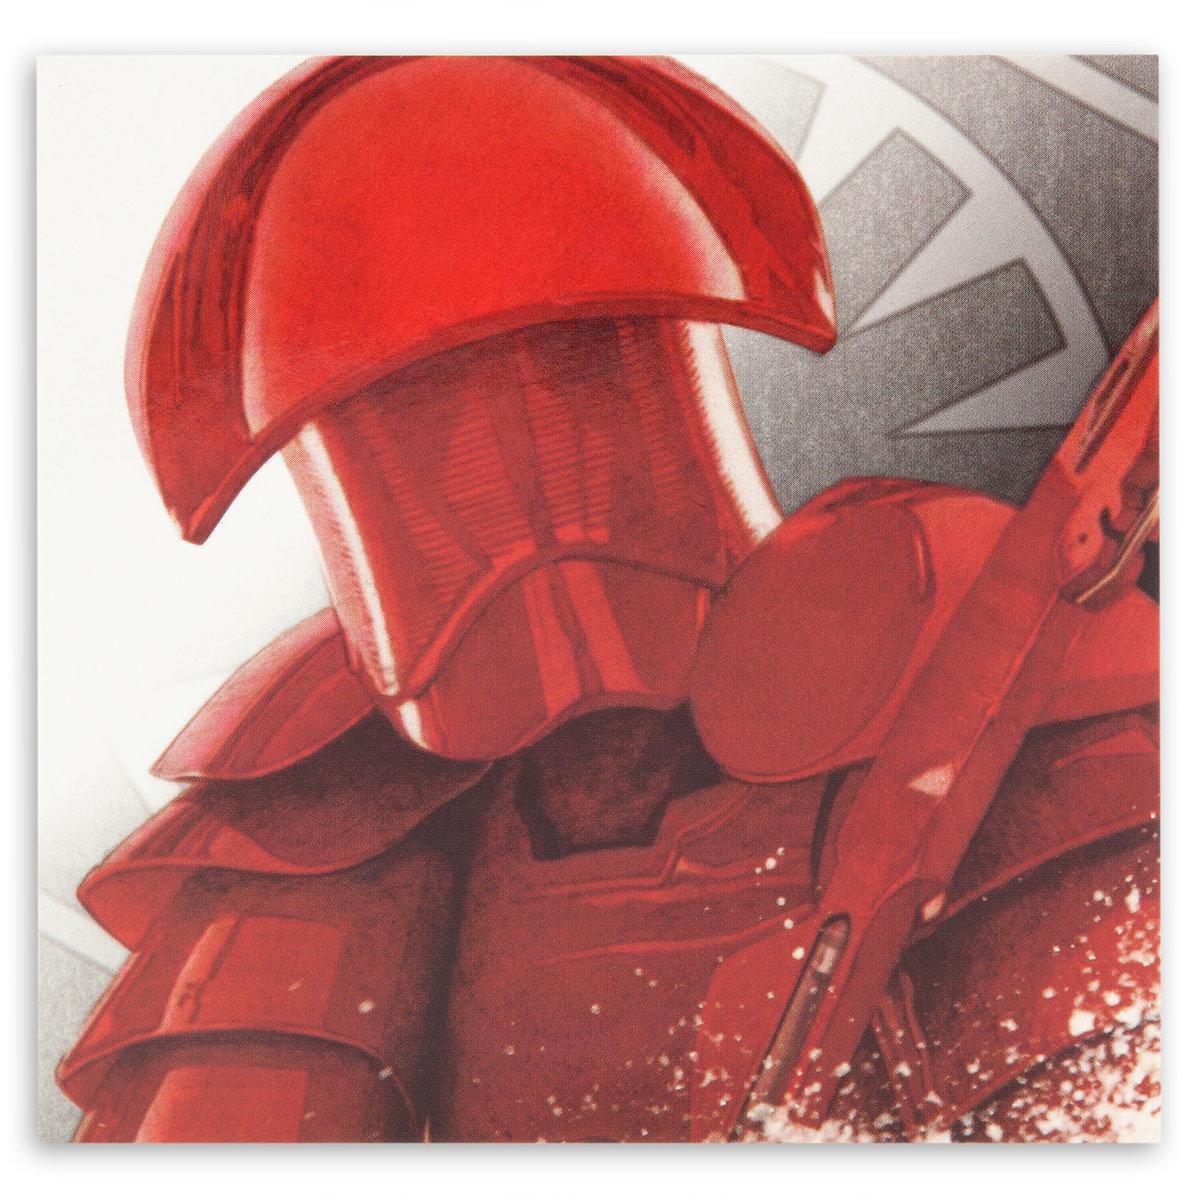 TLJ Praetorian Guard Pin & Lithograph Set 3